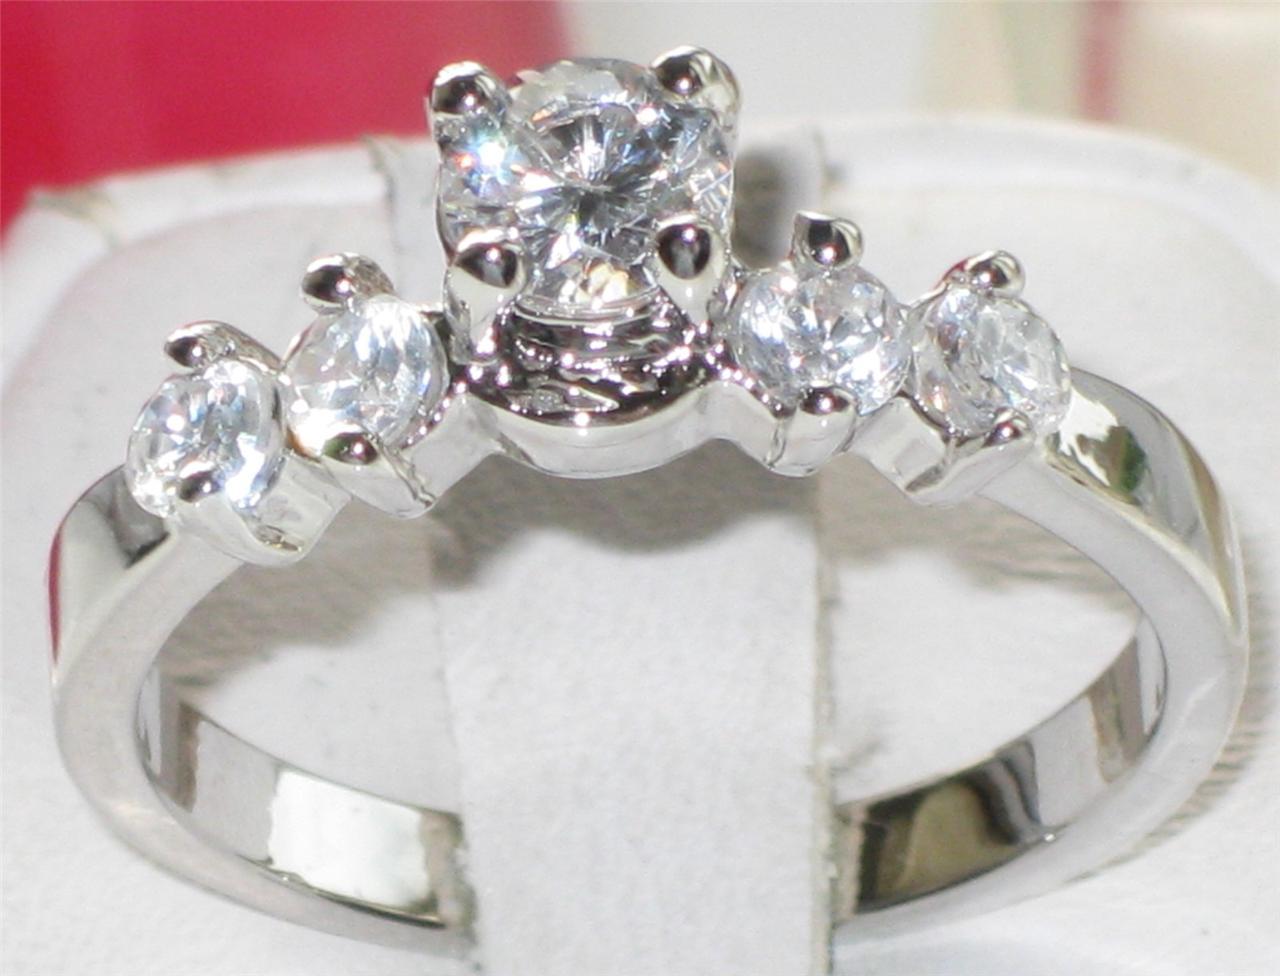 LADIES-5STONE-2-24CT-PRETTY-SIMULATED-DIAMOND-RING-PLATINUM-PLATED-R2201